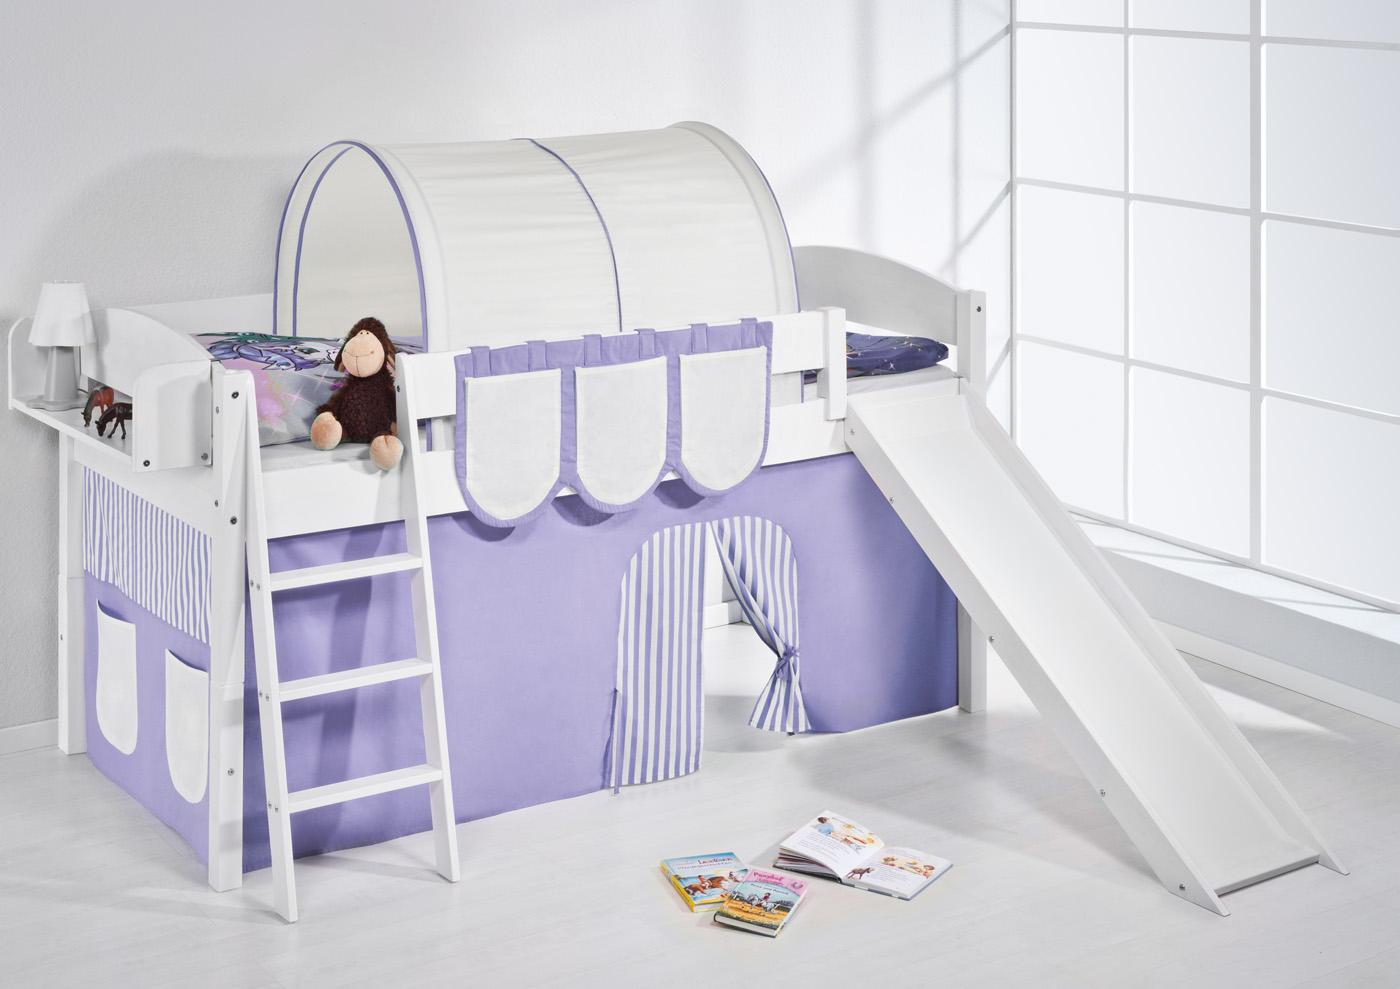 Etagenbett Einzelbett : Etagenbett massivholz kiefer matratze bettkasten